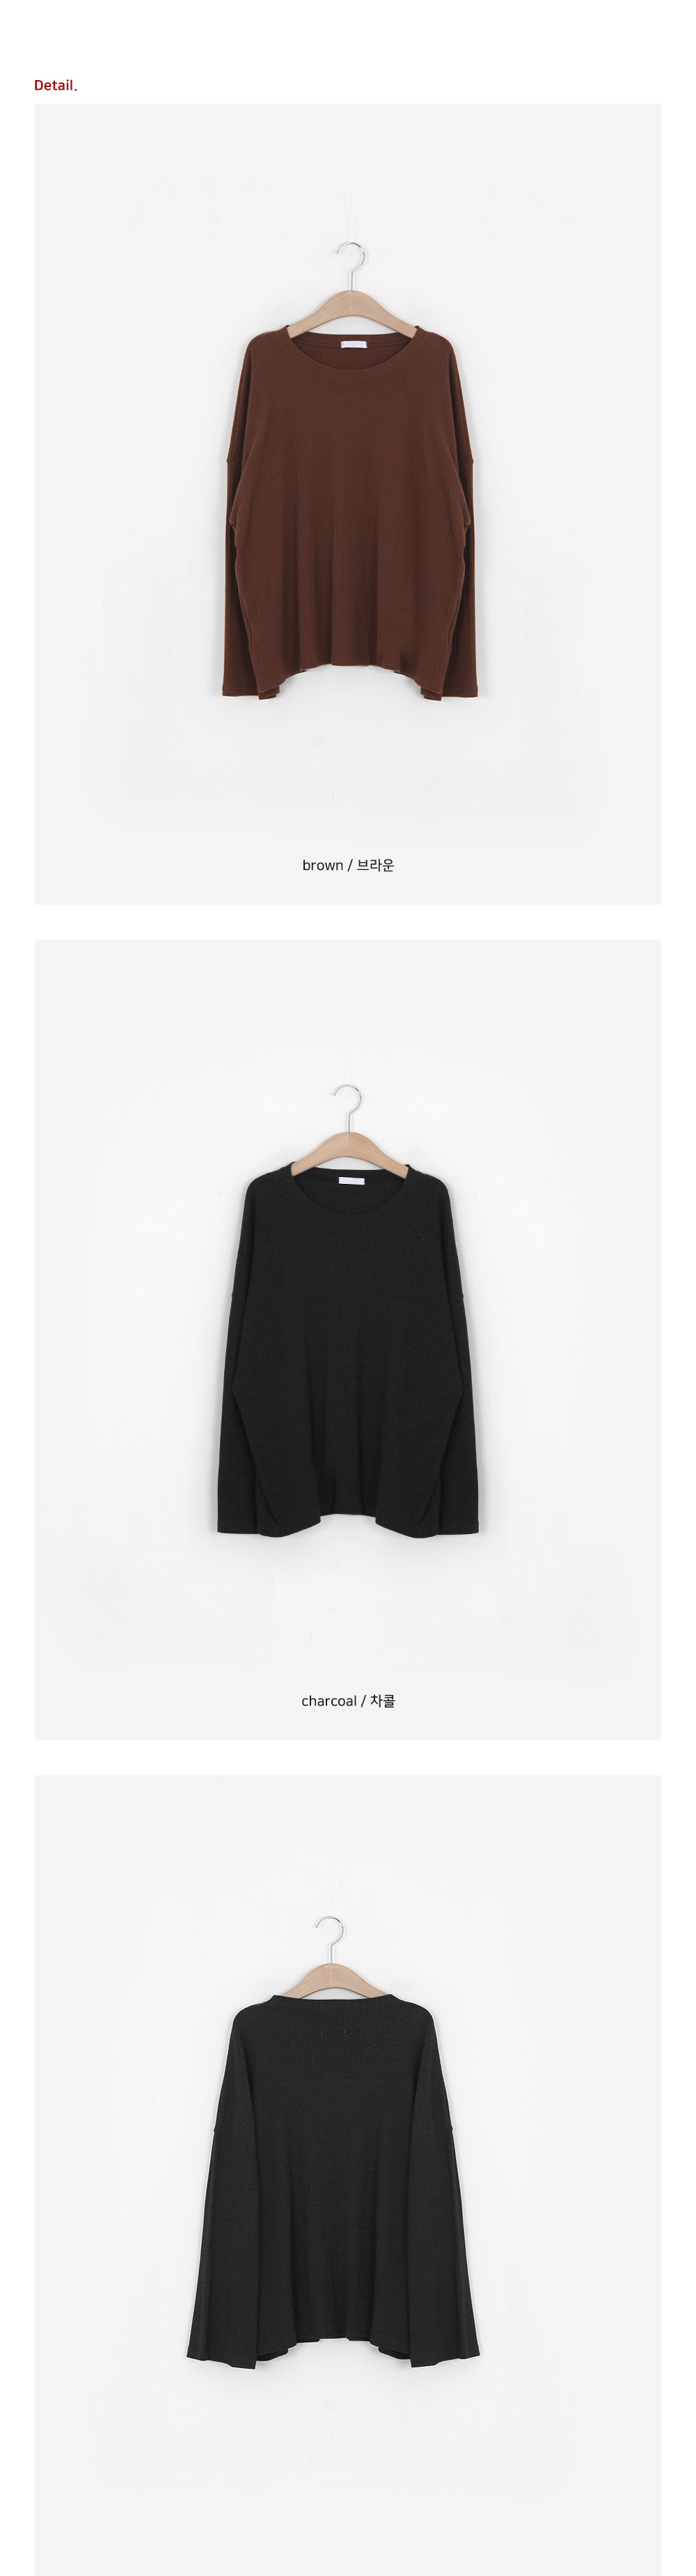 SALE) Boxy ribbed cotton T-shirt